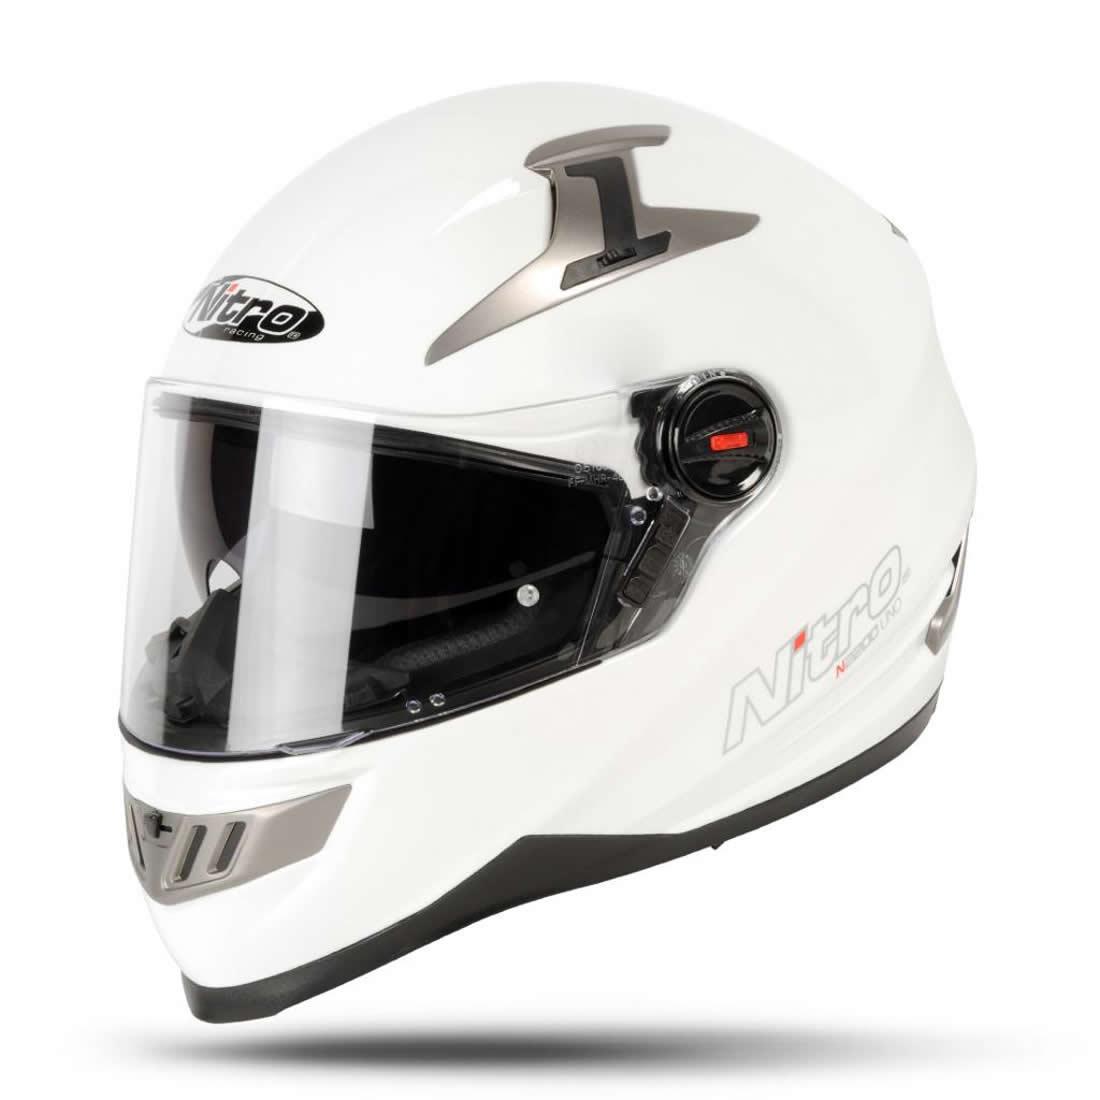 NITRO-N2200-UNO-DVS-CASQUE-MOTO-SCOOTER-INTEGRAL-PARE-SOLEIL-INTERNE-URBAIN-CITE